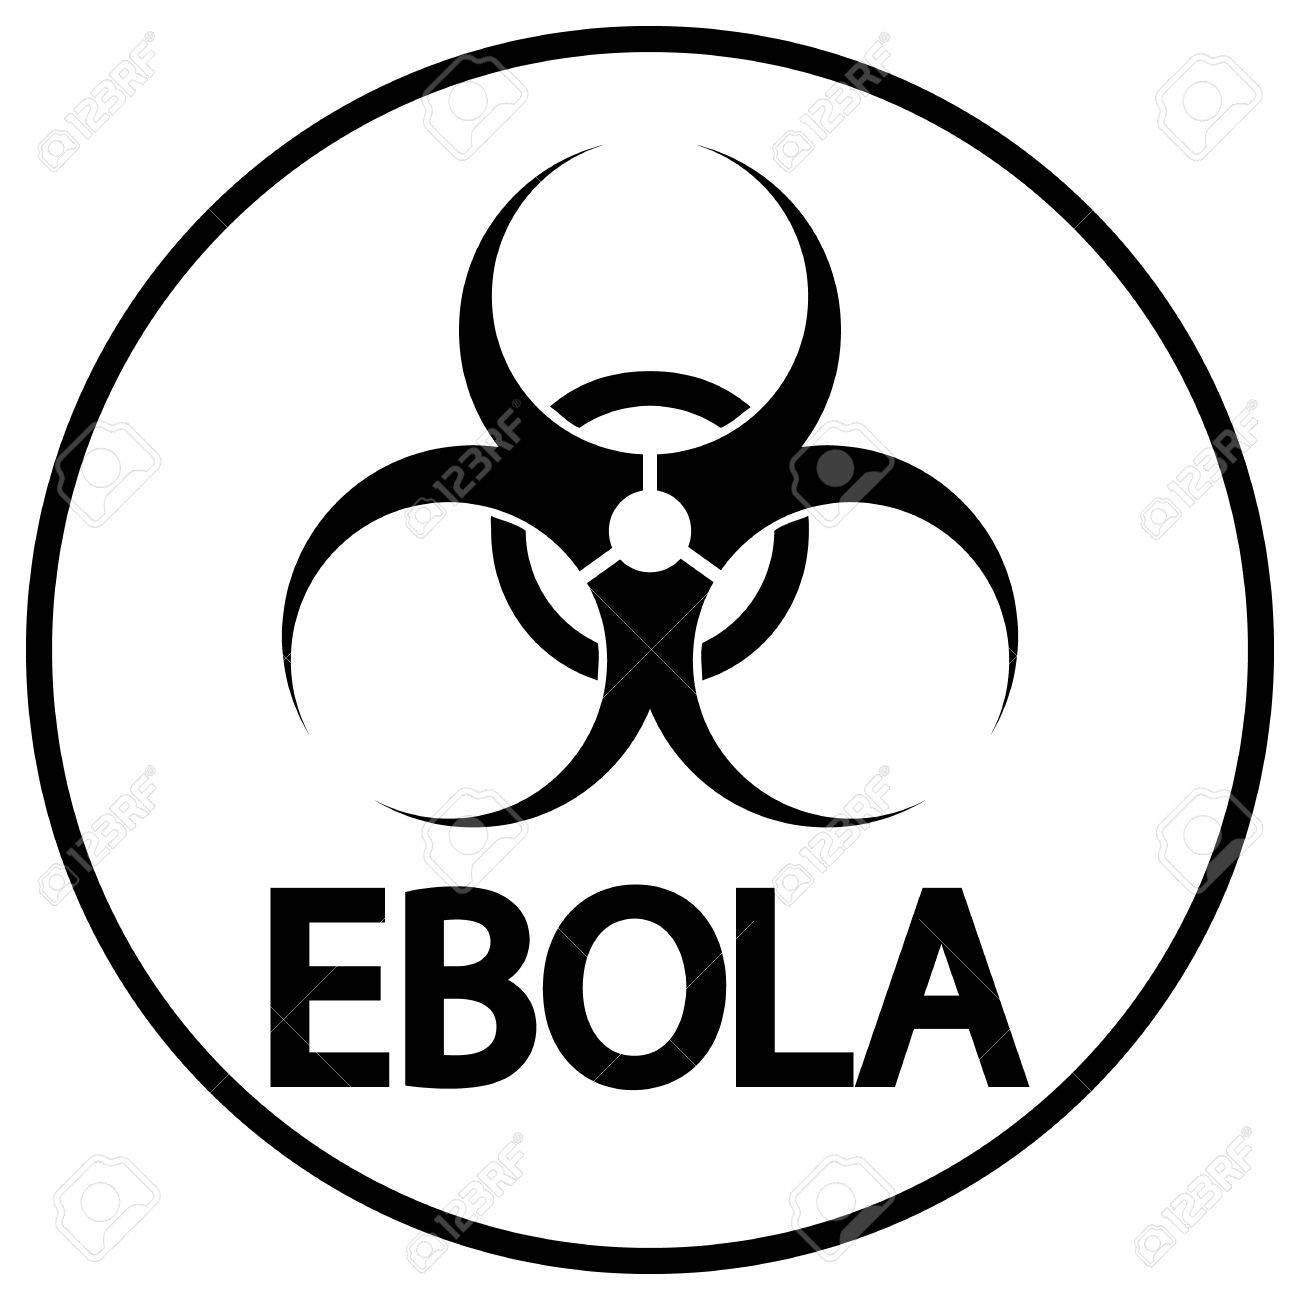 Ebola Virus Icon On White Background Royalty Cliparts 1300x1300